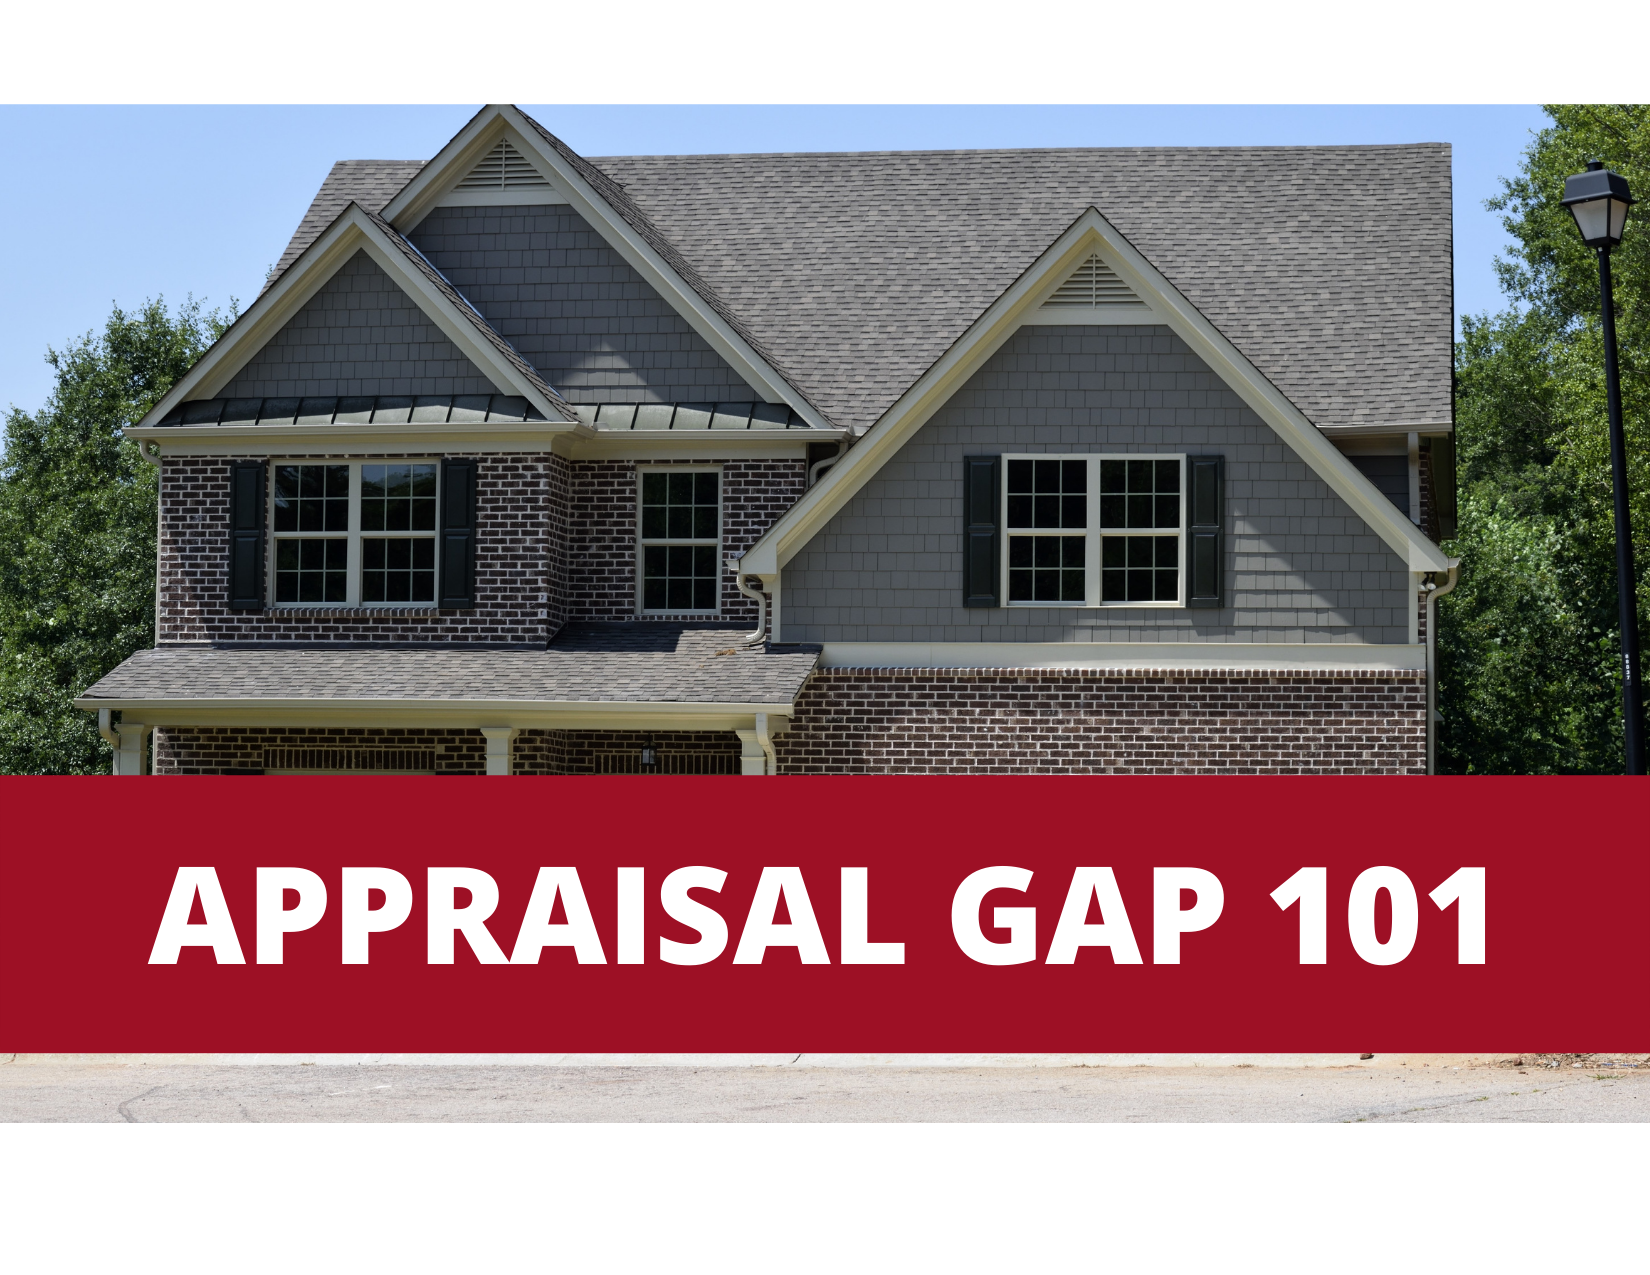 Appraisal Gap 101